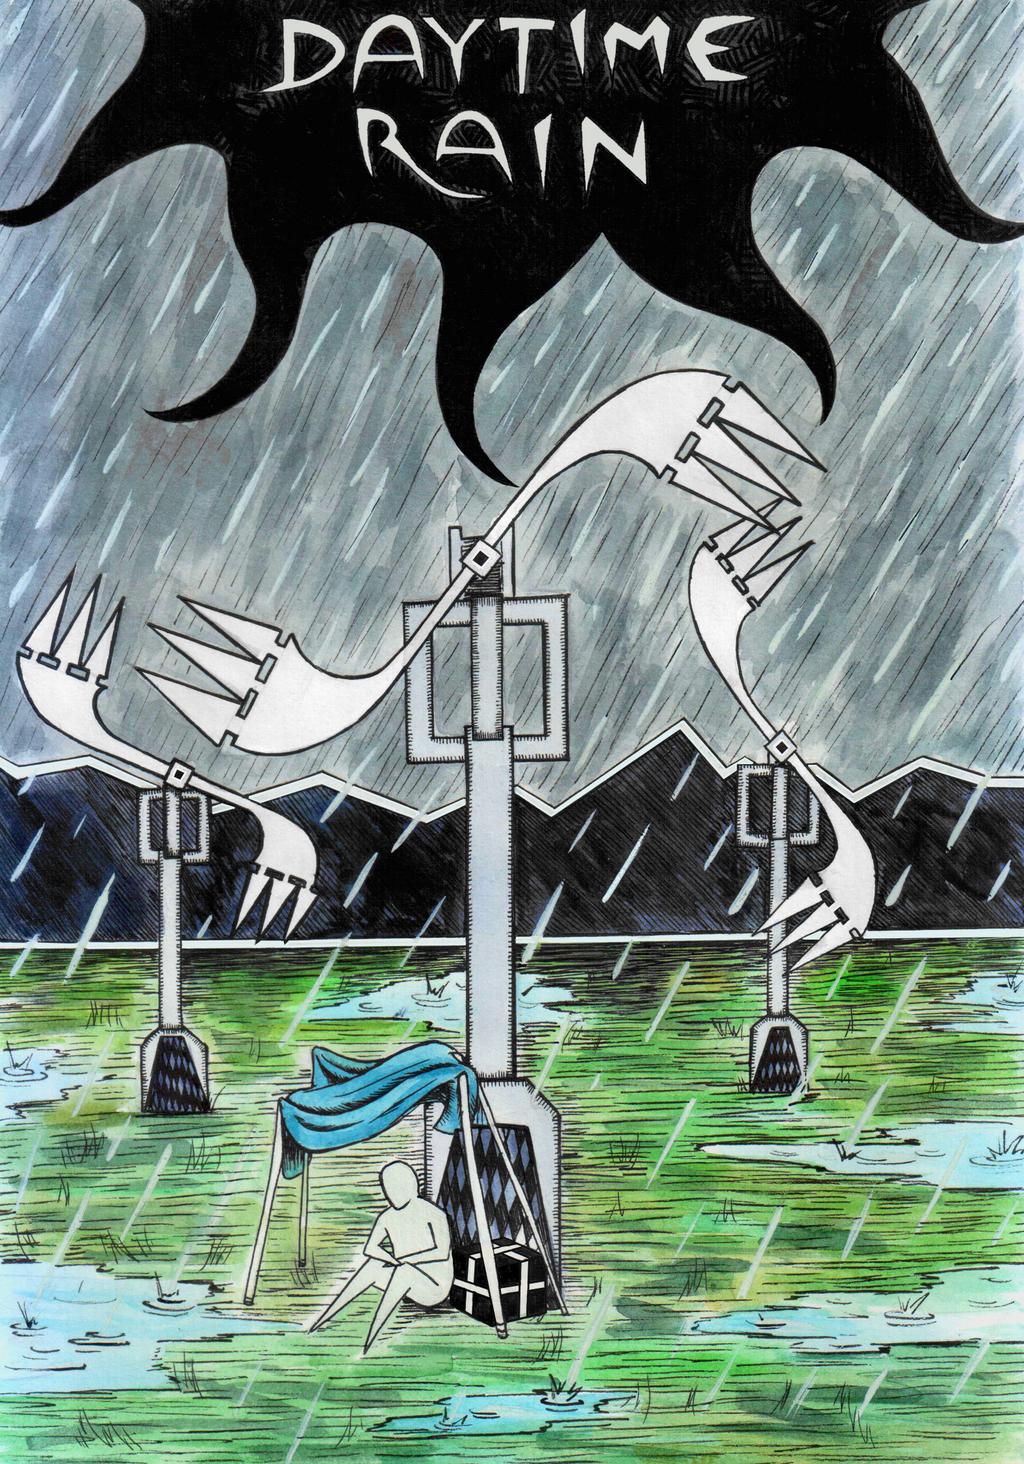 Daytime Rain by Djigallag